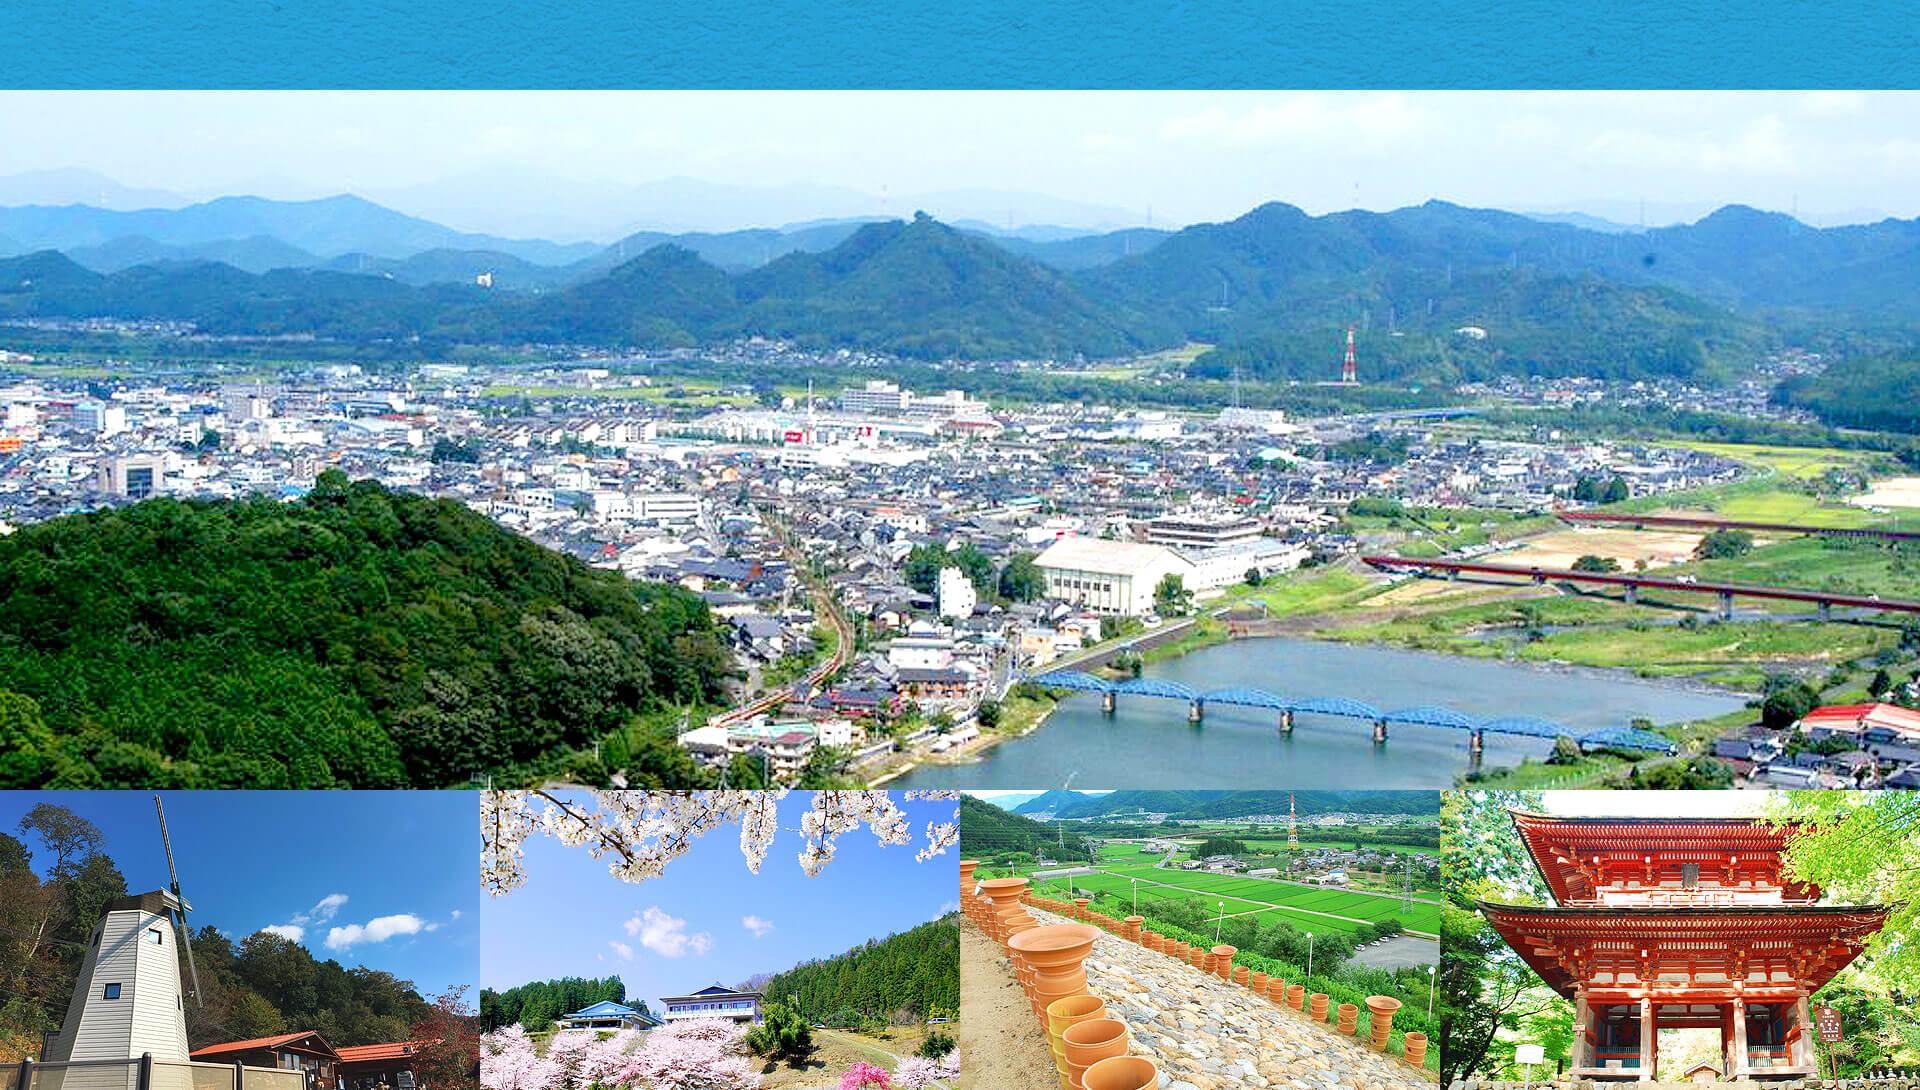 綾部市の写真